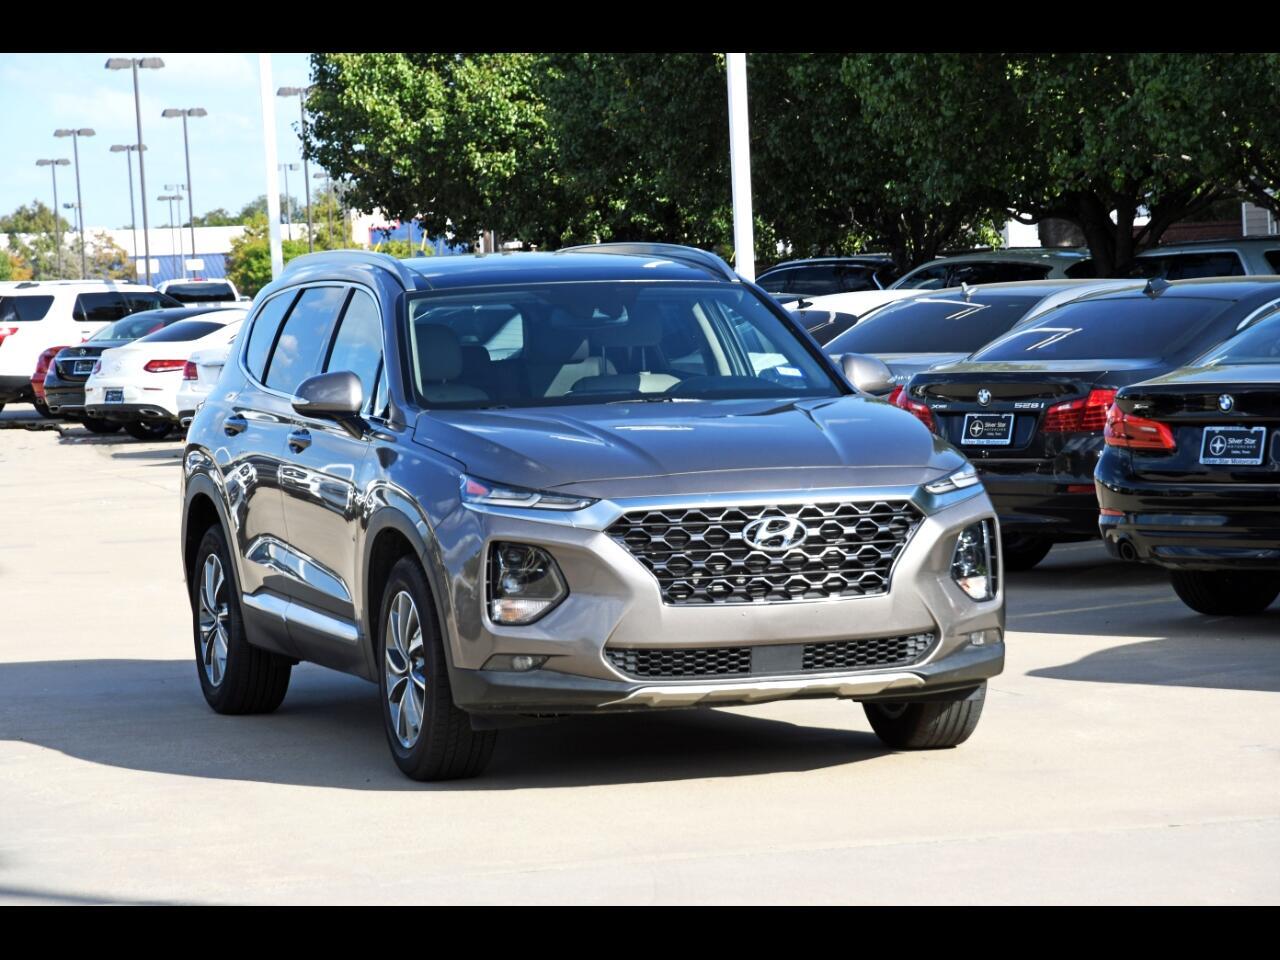 Hyundai Santa Fe Limited 2.4L Auto FWD 2019